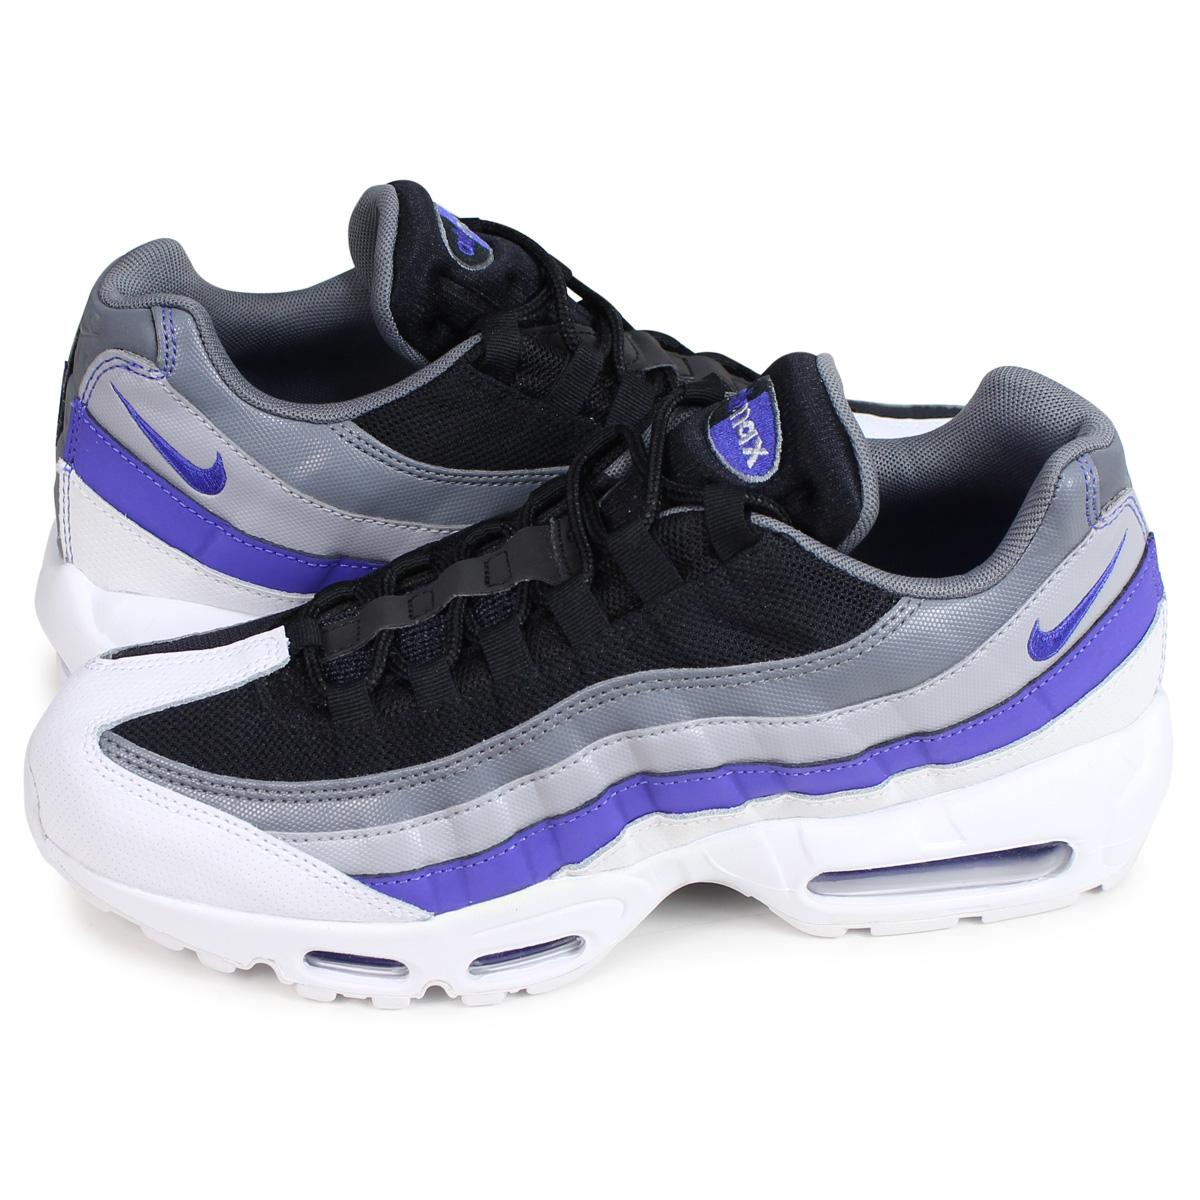 best service f47ec 7a95d Nike NIKE Air Max 95 essential sneakers men AIR MAX 95 ESSENTIAL white  white 749,766- ...